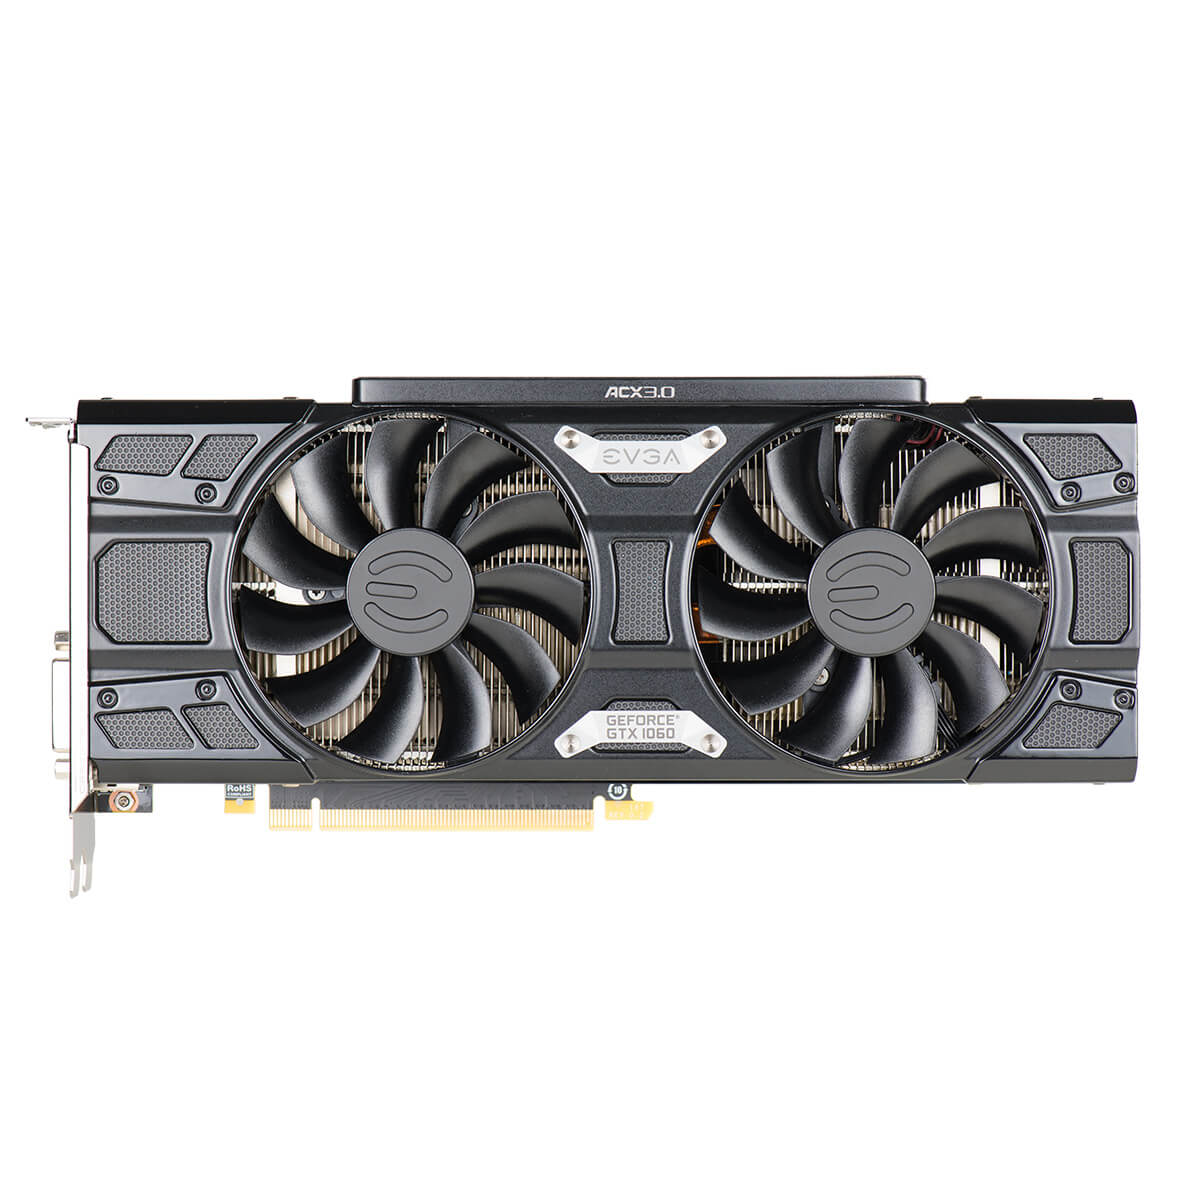 EVGA GeForce GTX 1060 SSC GAMING 6GB GDDR5